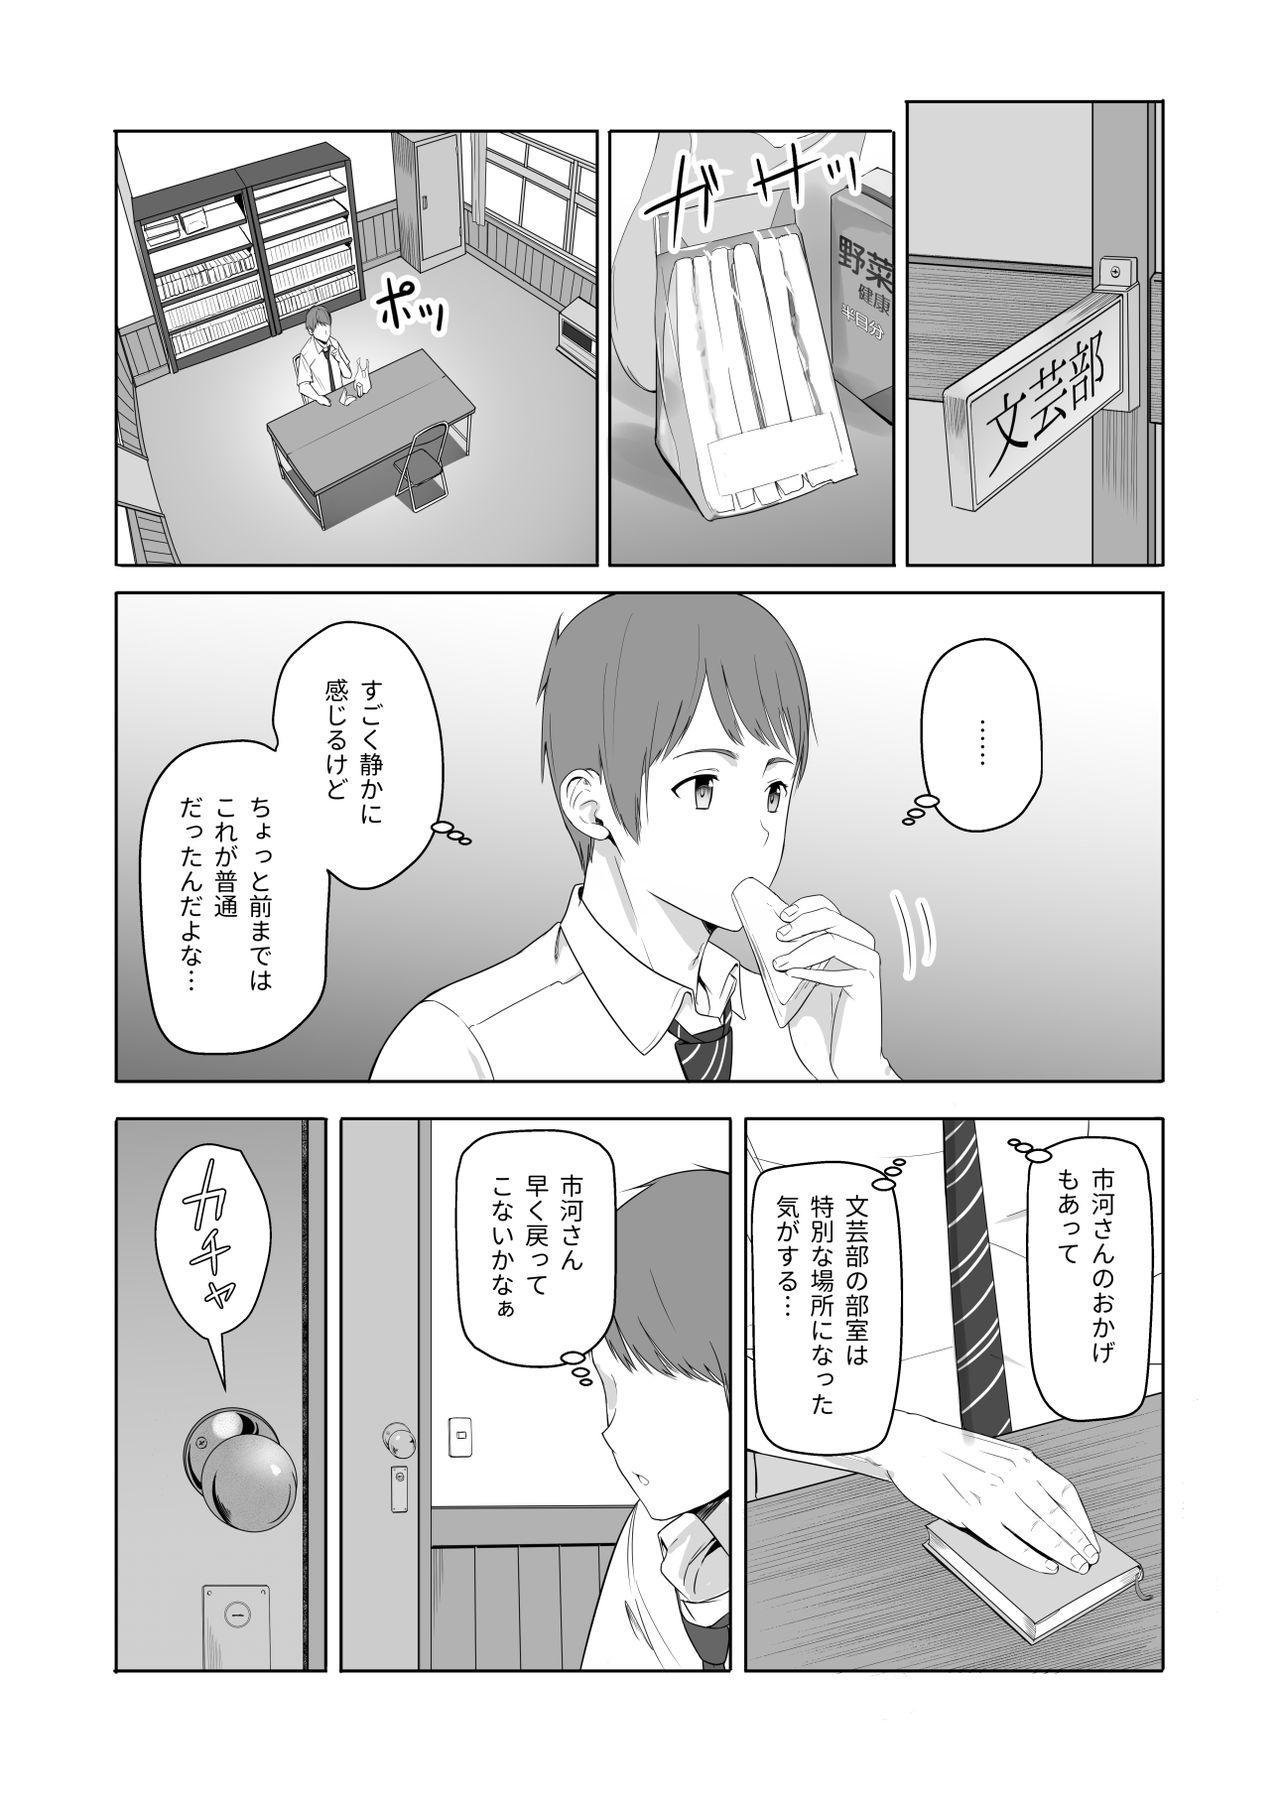 Kimi ga Tame. 2 Ichikawa Inori 15